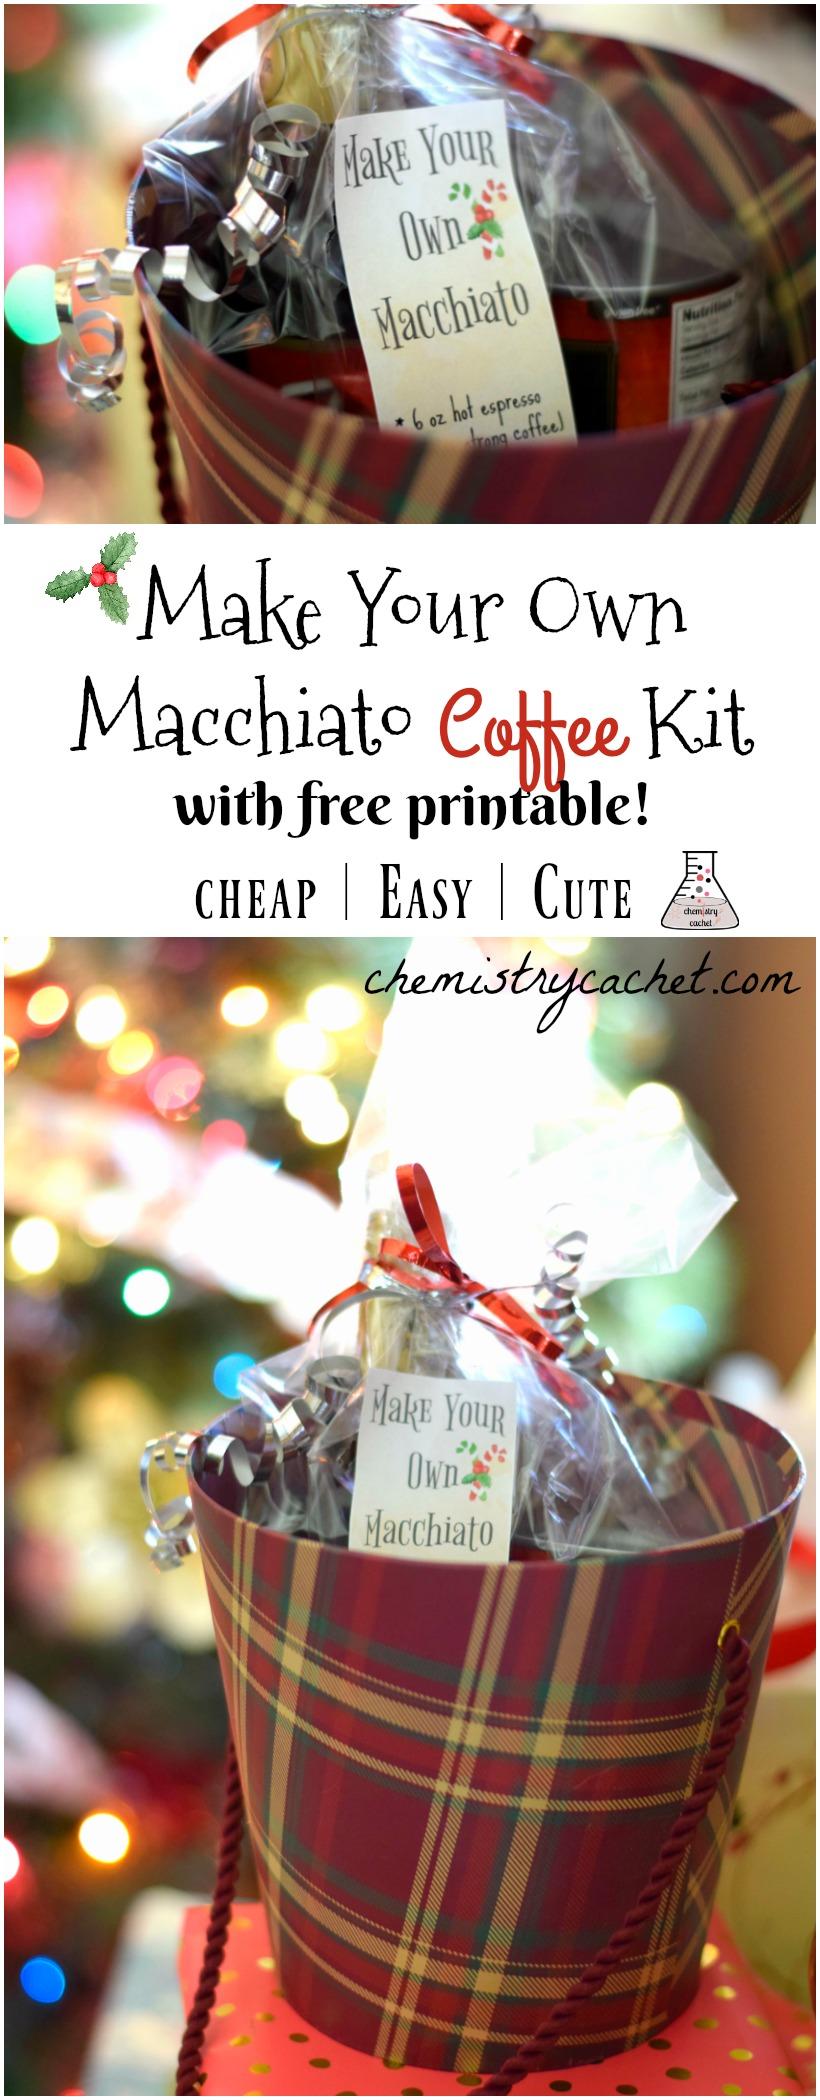 Make your own macchiato kit for christmas! Perfect christmas gift DIY, coffee kit DIY tutorial on chemistrycachet.com with free printable!